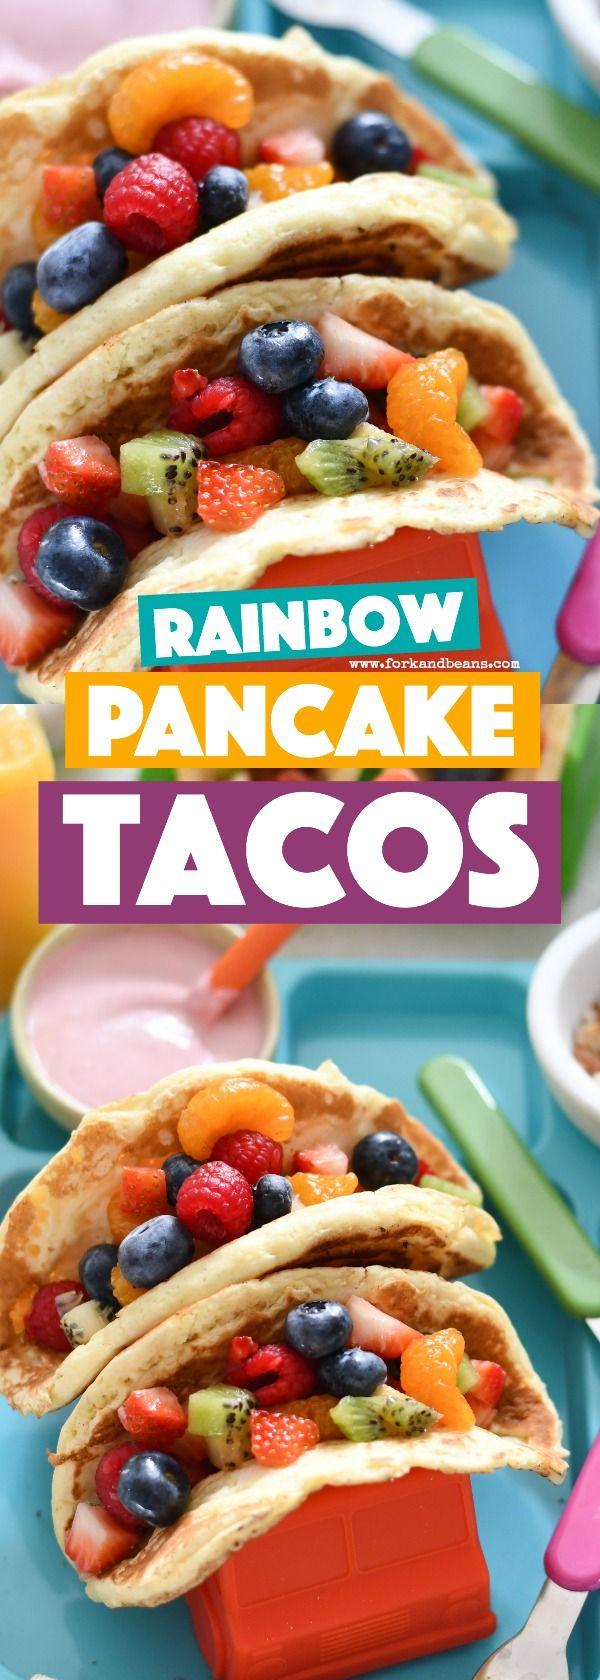 With a rainbow fruit salad, yogurt drizzle, and sprinkle of chopped nuts, Rainbow Pancake Tacos make for a fun new breakfast idea! #kidfood #funfood #breakfastforkids #rainbowfood